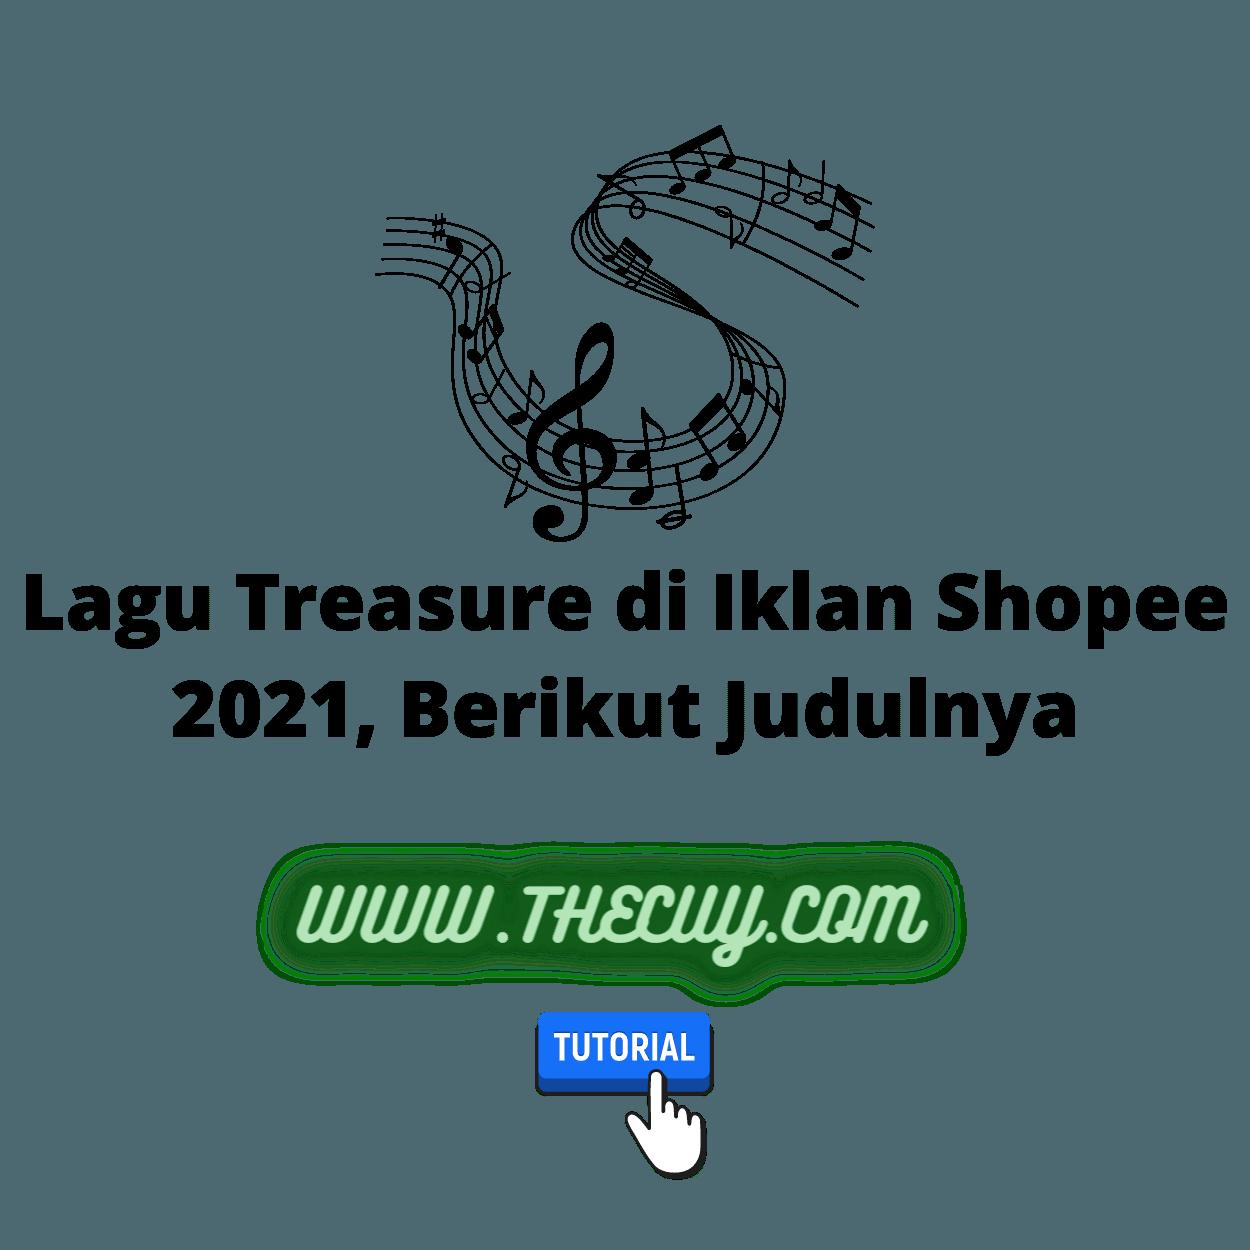 Lagu Treasure di Iklan Shopee 2021, Berikut Judulnya